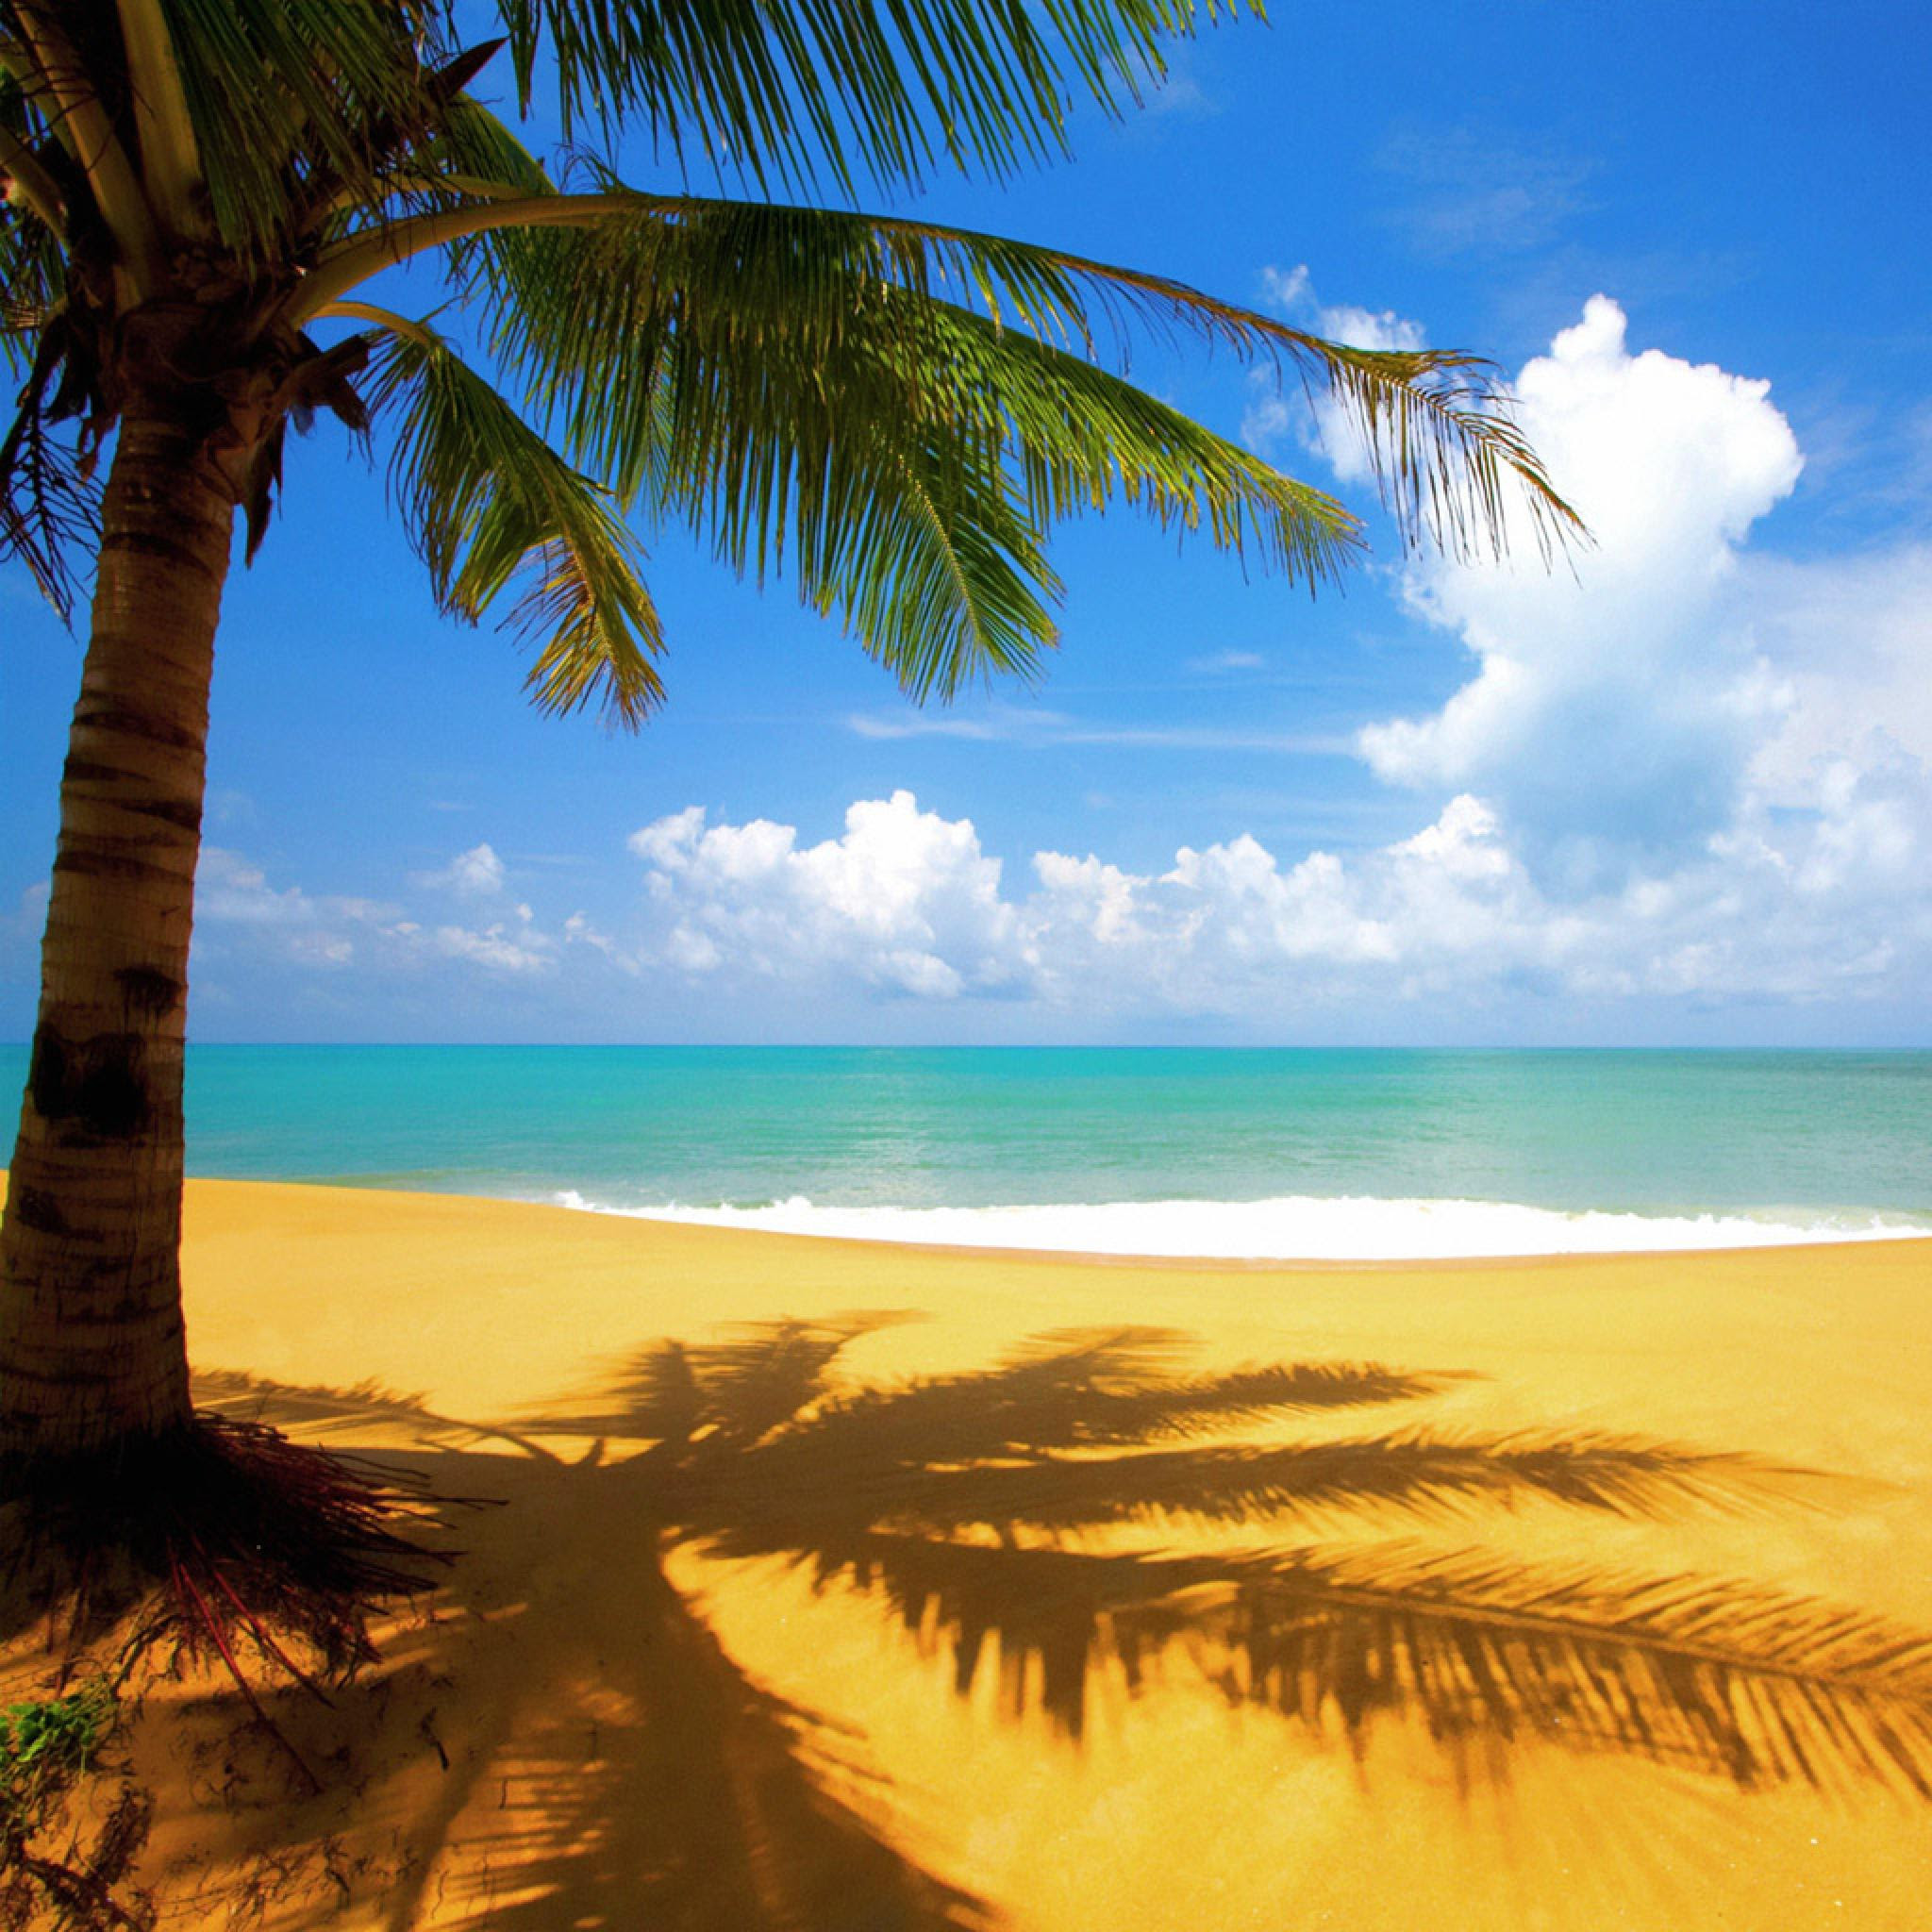 Nature - Tropical Palm Tree On Beach - iPad iPhone HD ...